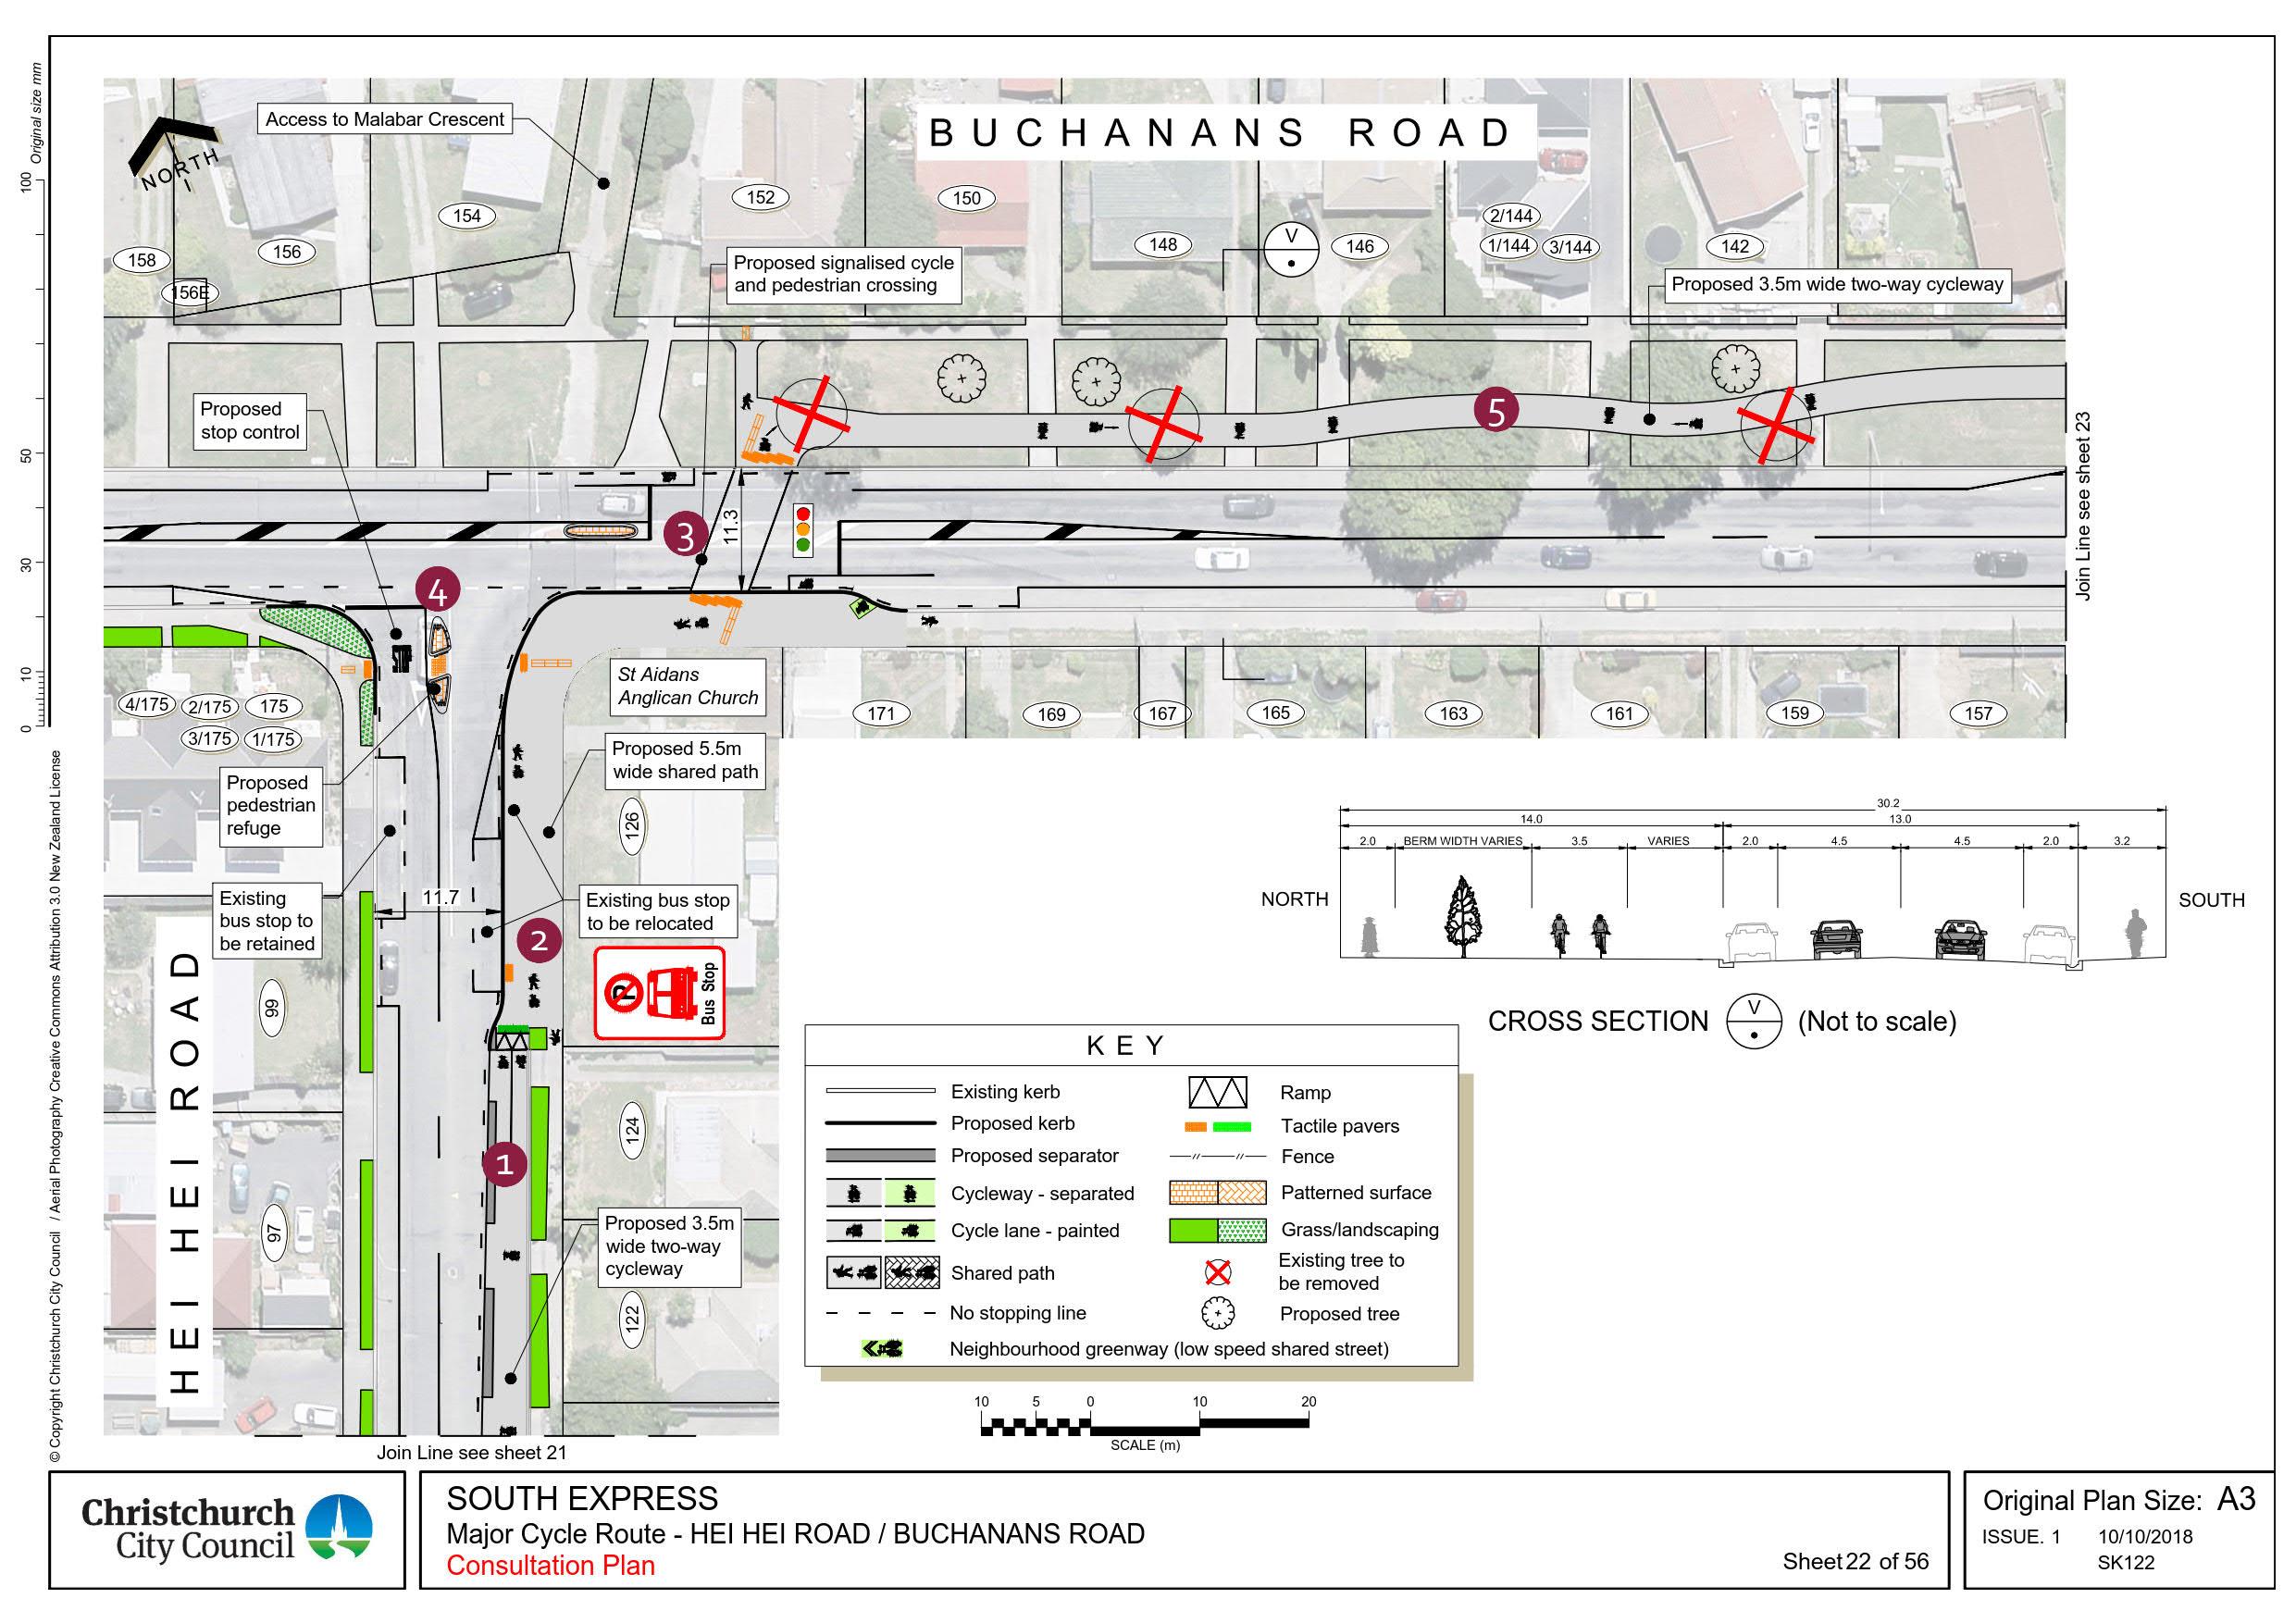 'Hei Hei Road and Buchanans Road